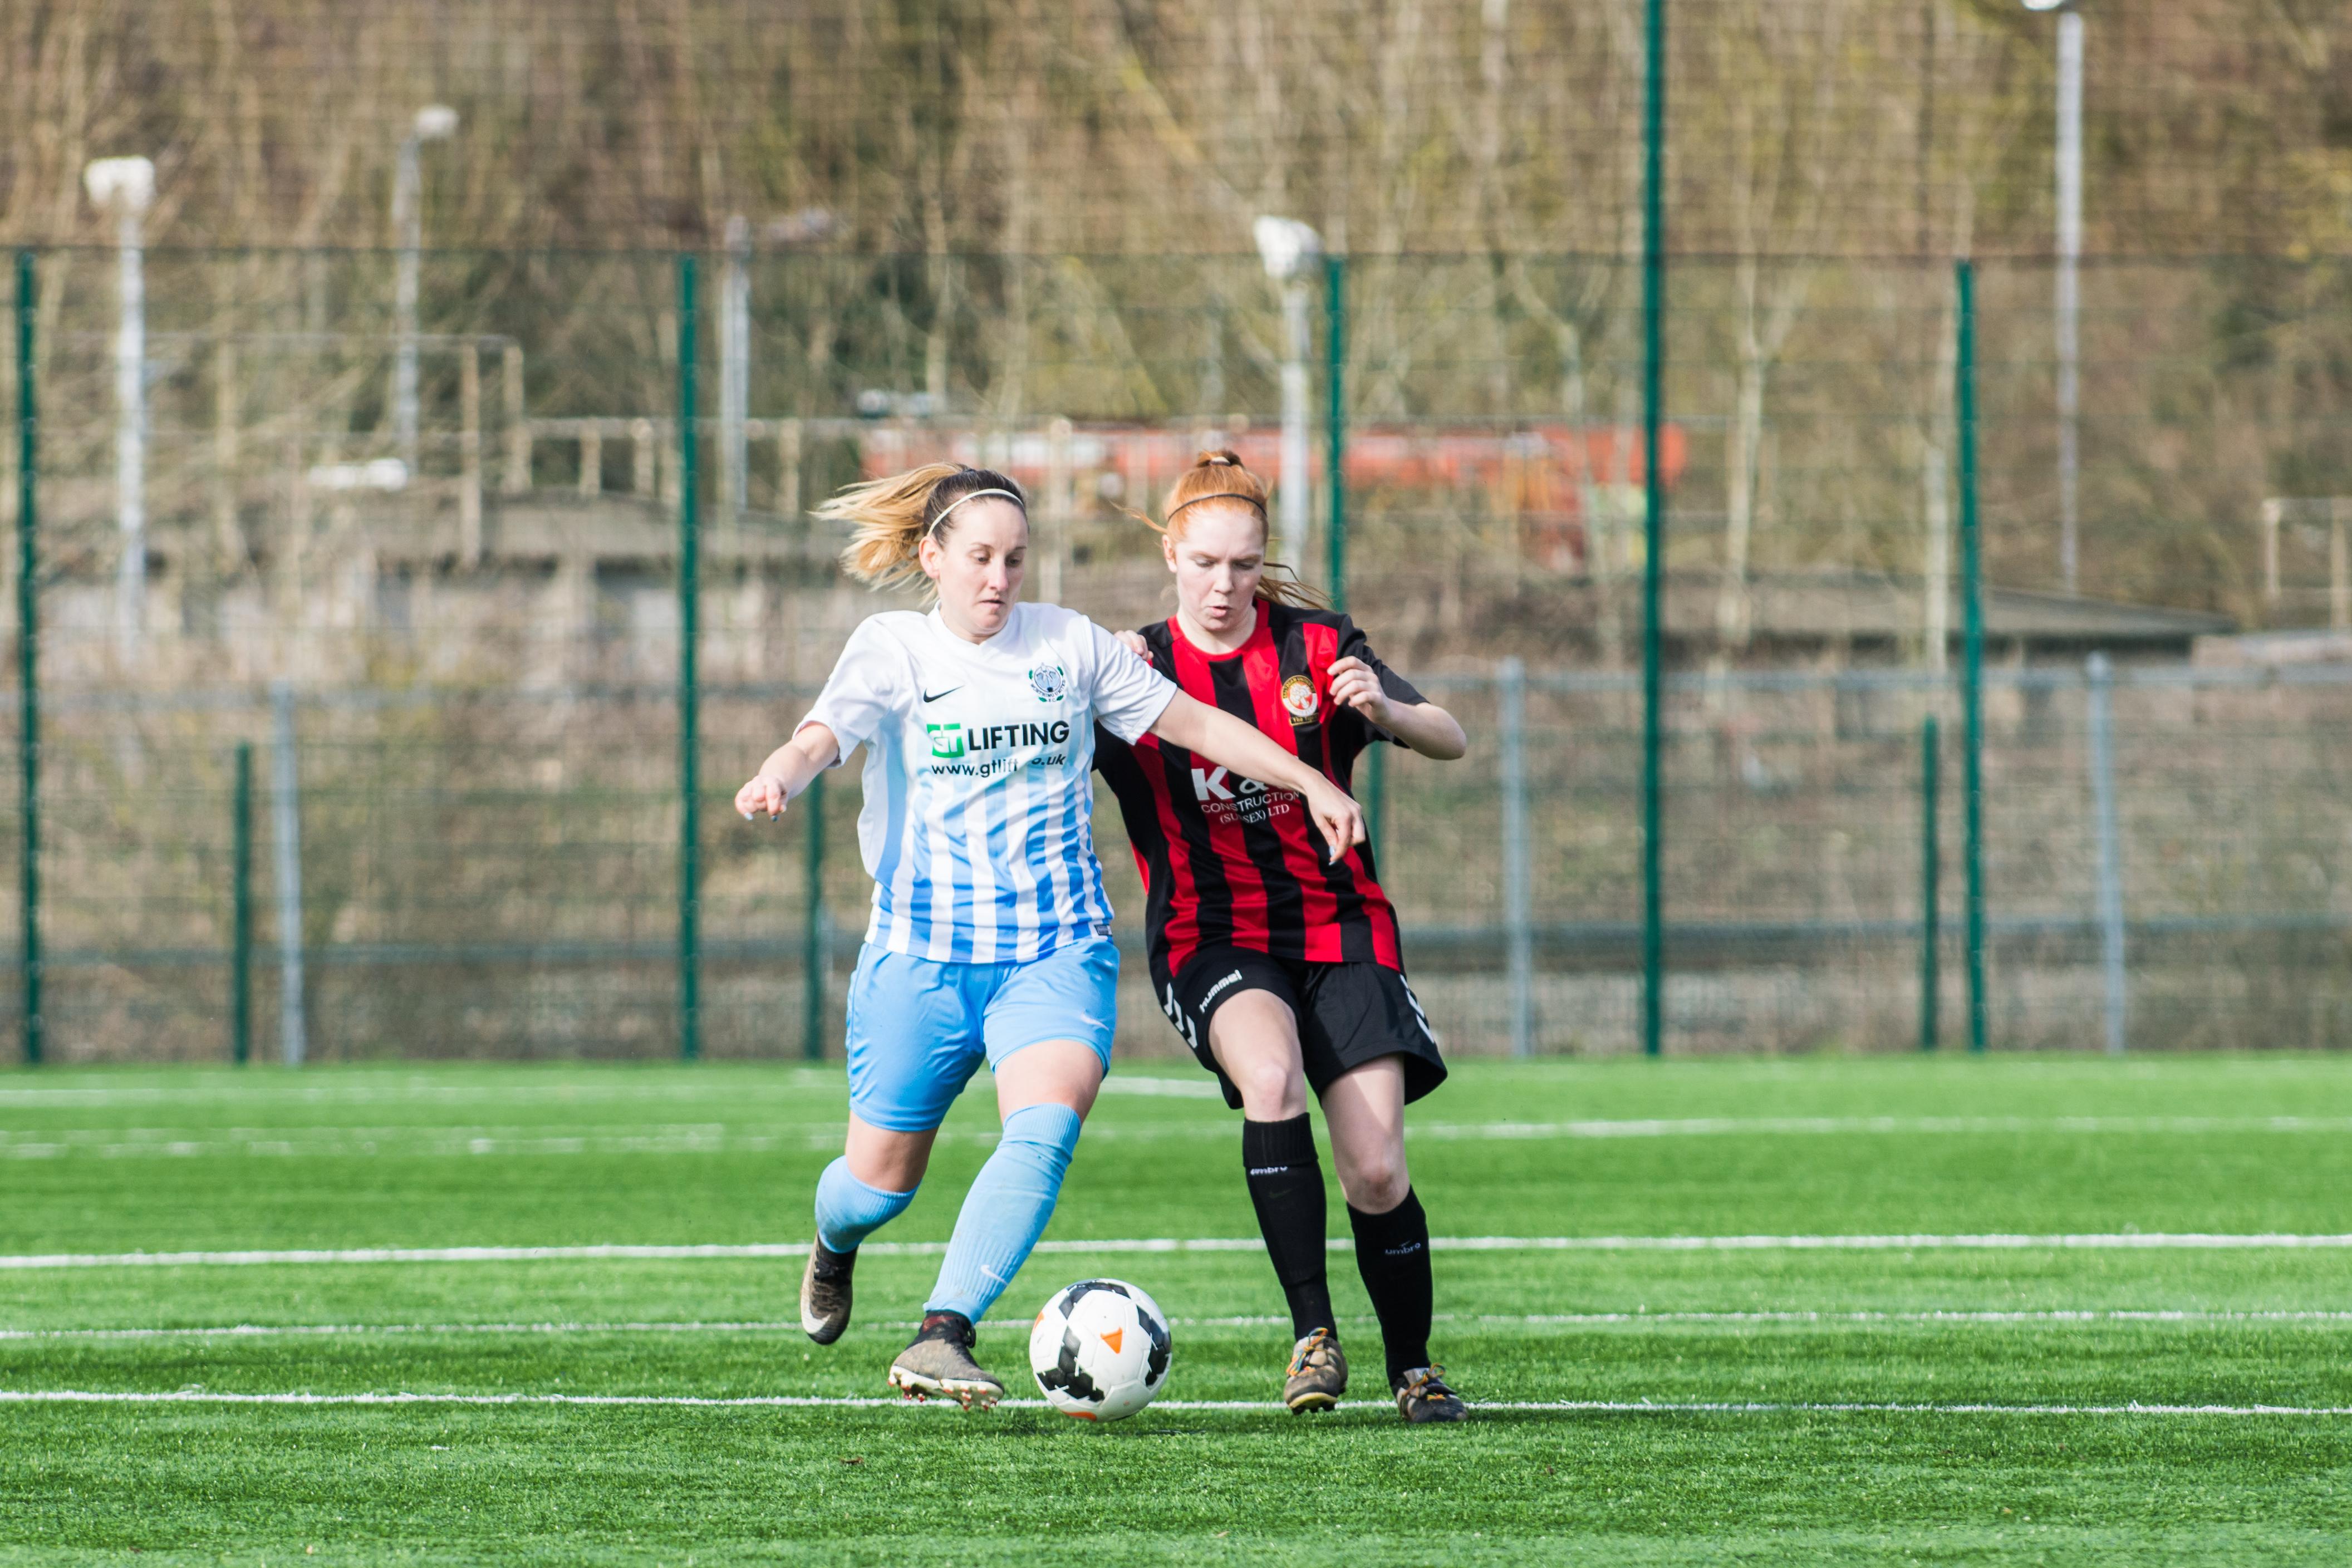 DAVID_JEFFERY Saltdean Utd Ladies FC vs Worthing Utd Ladies FC 11.03.18 06